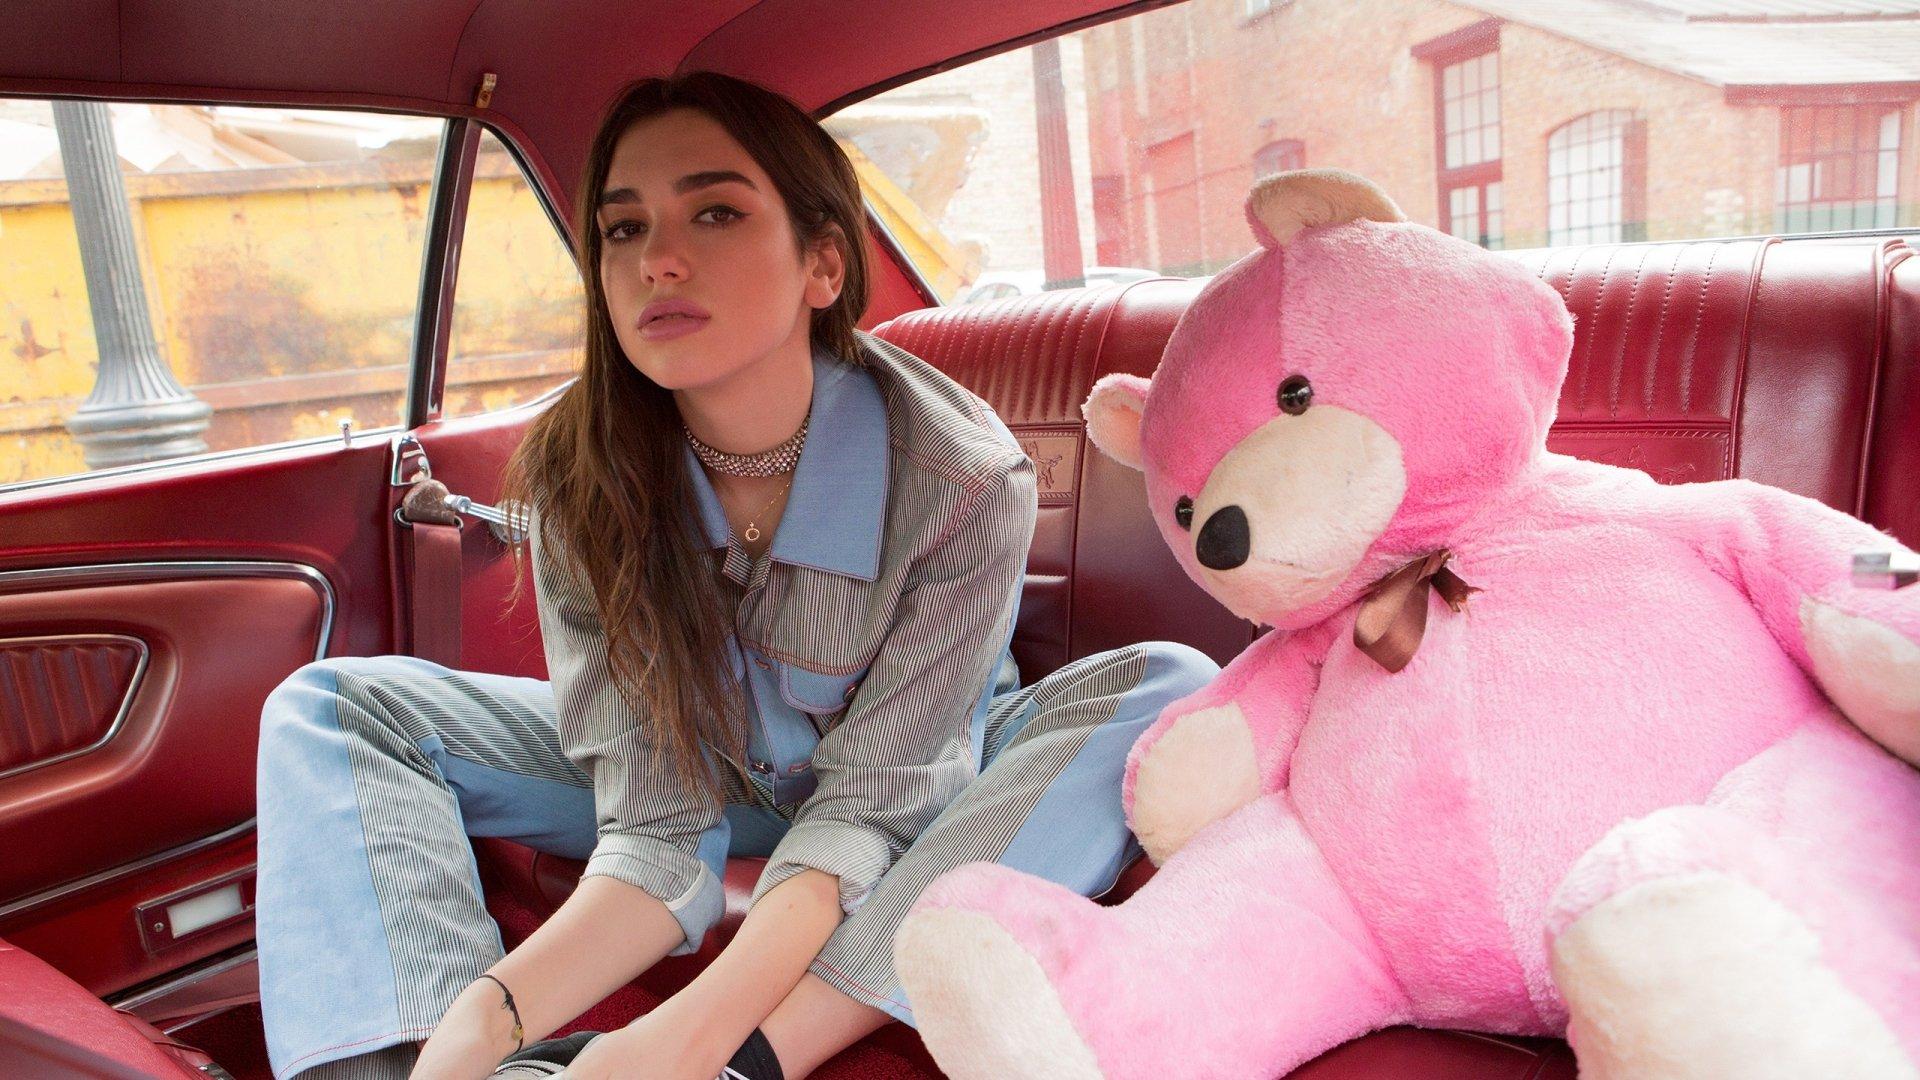 Car Wallpapers 3840x1200 Dua Lipa With Pink Teddy Bear Lol Hd Wallpaper